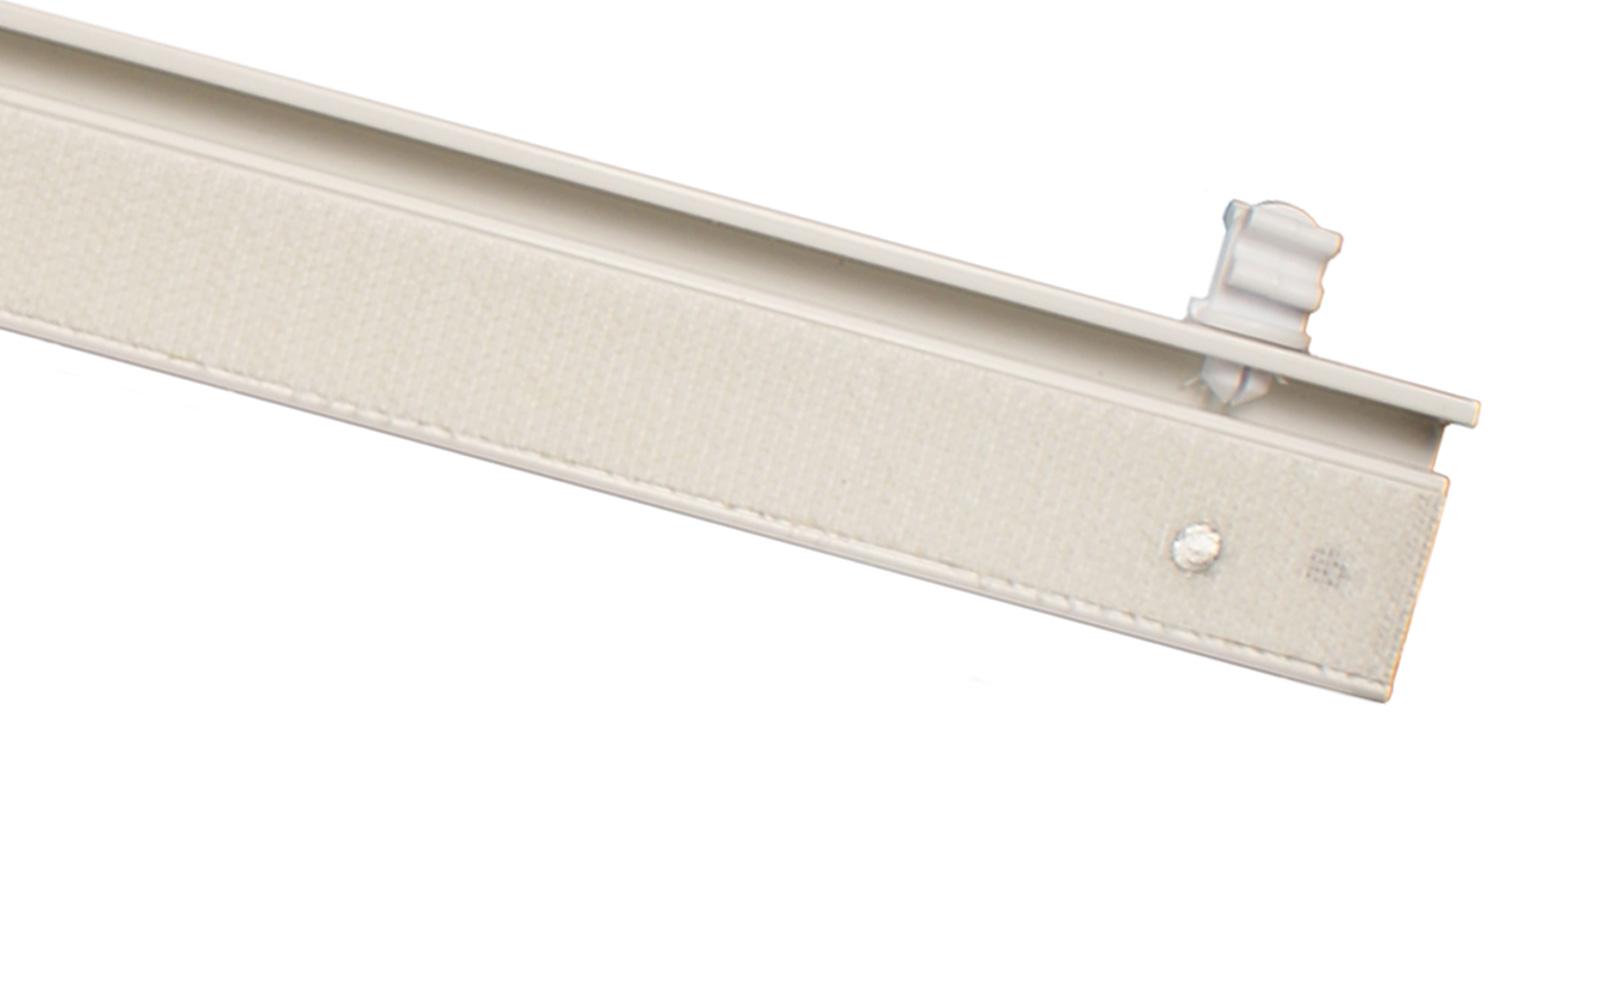 2 l ufige gardinenschiene aus aluminium alu silber for Design couchtisch remember in silber aus aluminium